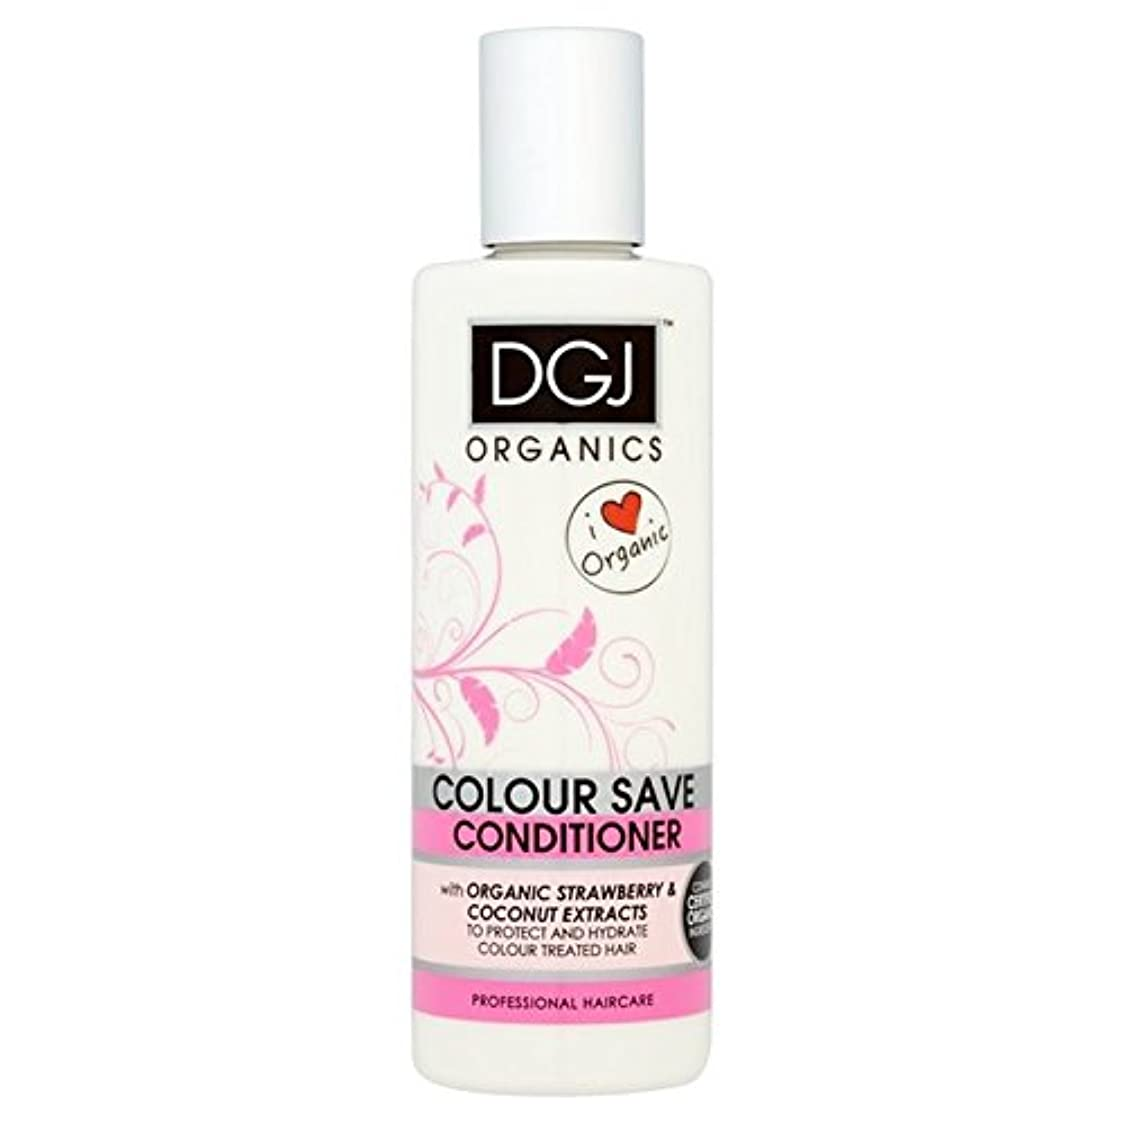 DGJ Organics Colour Save Conditioner 250ml - 有機物の色コンディショナー250を保存 [並行輸入品]